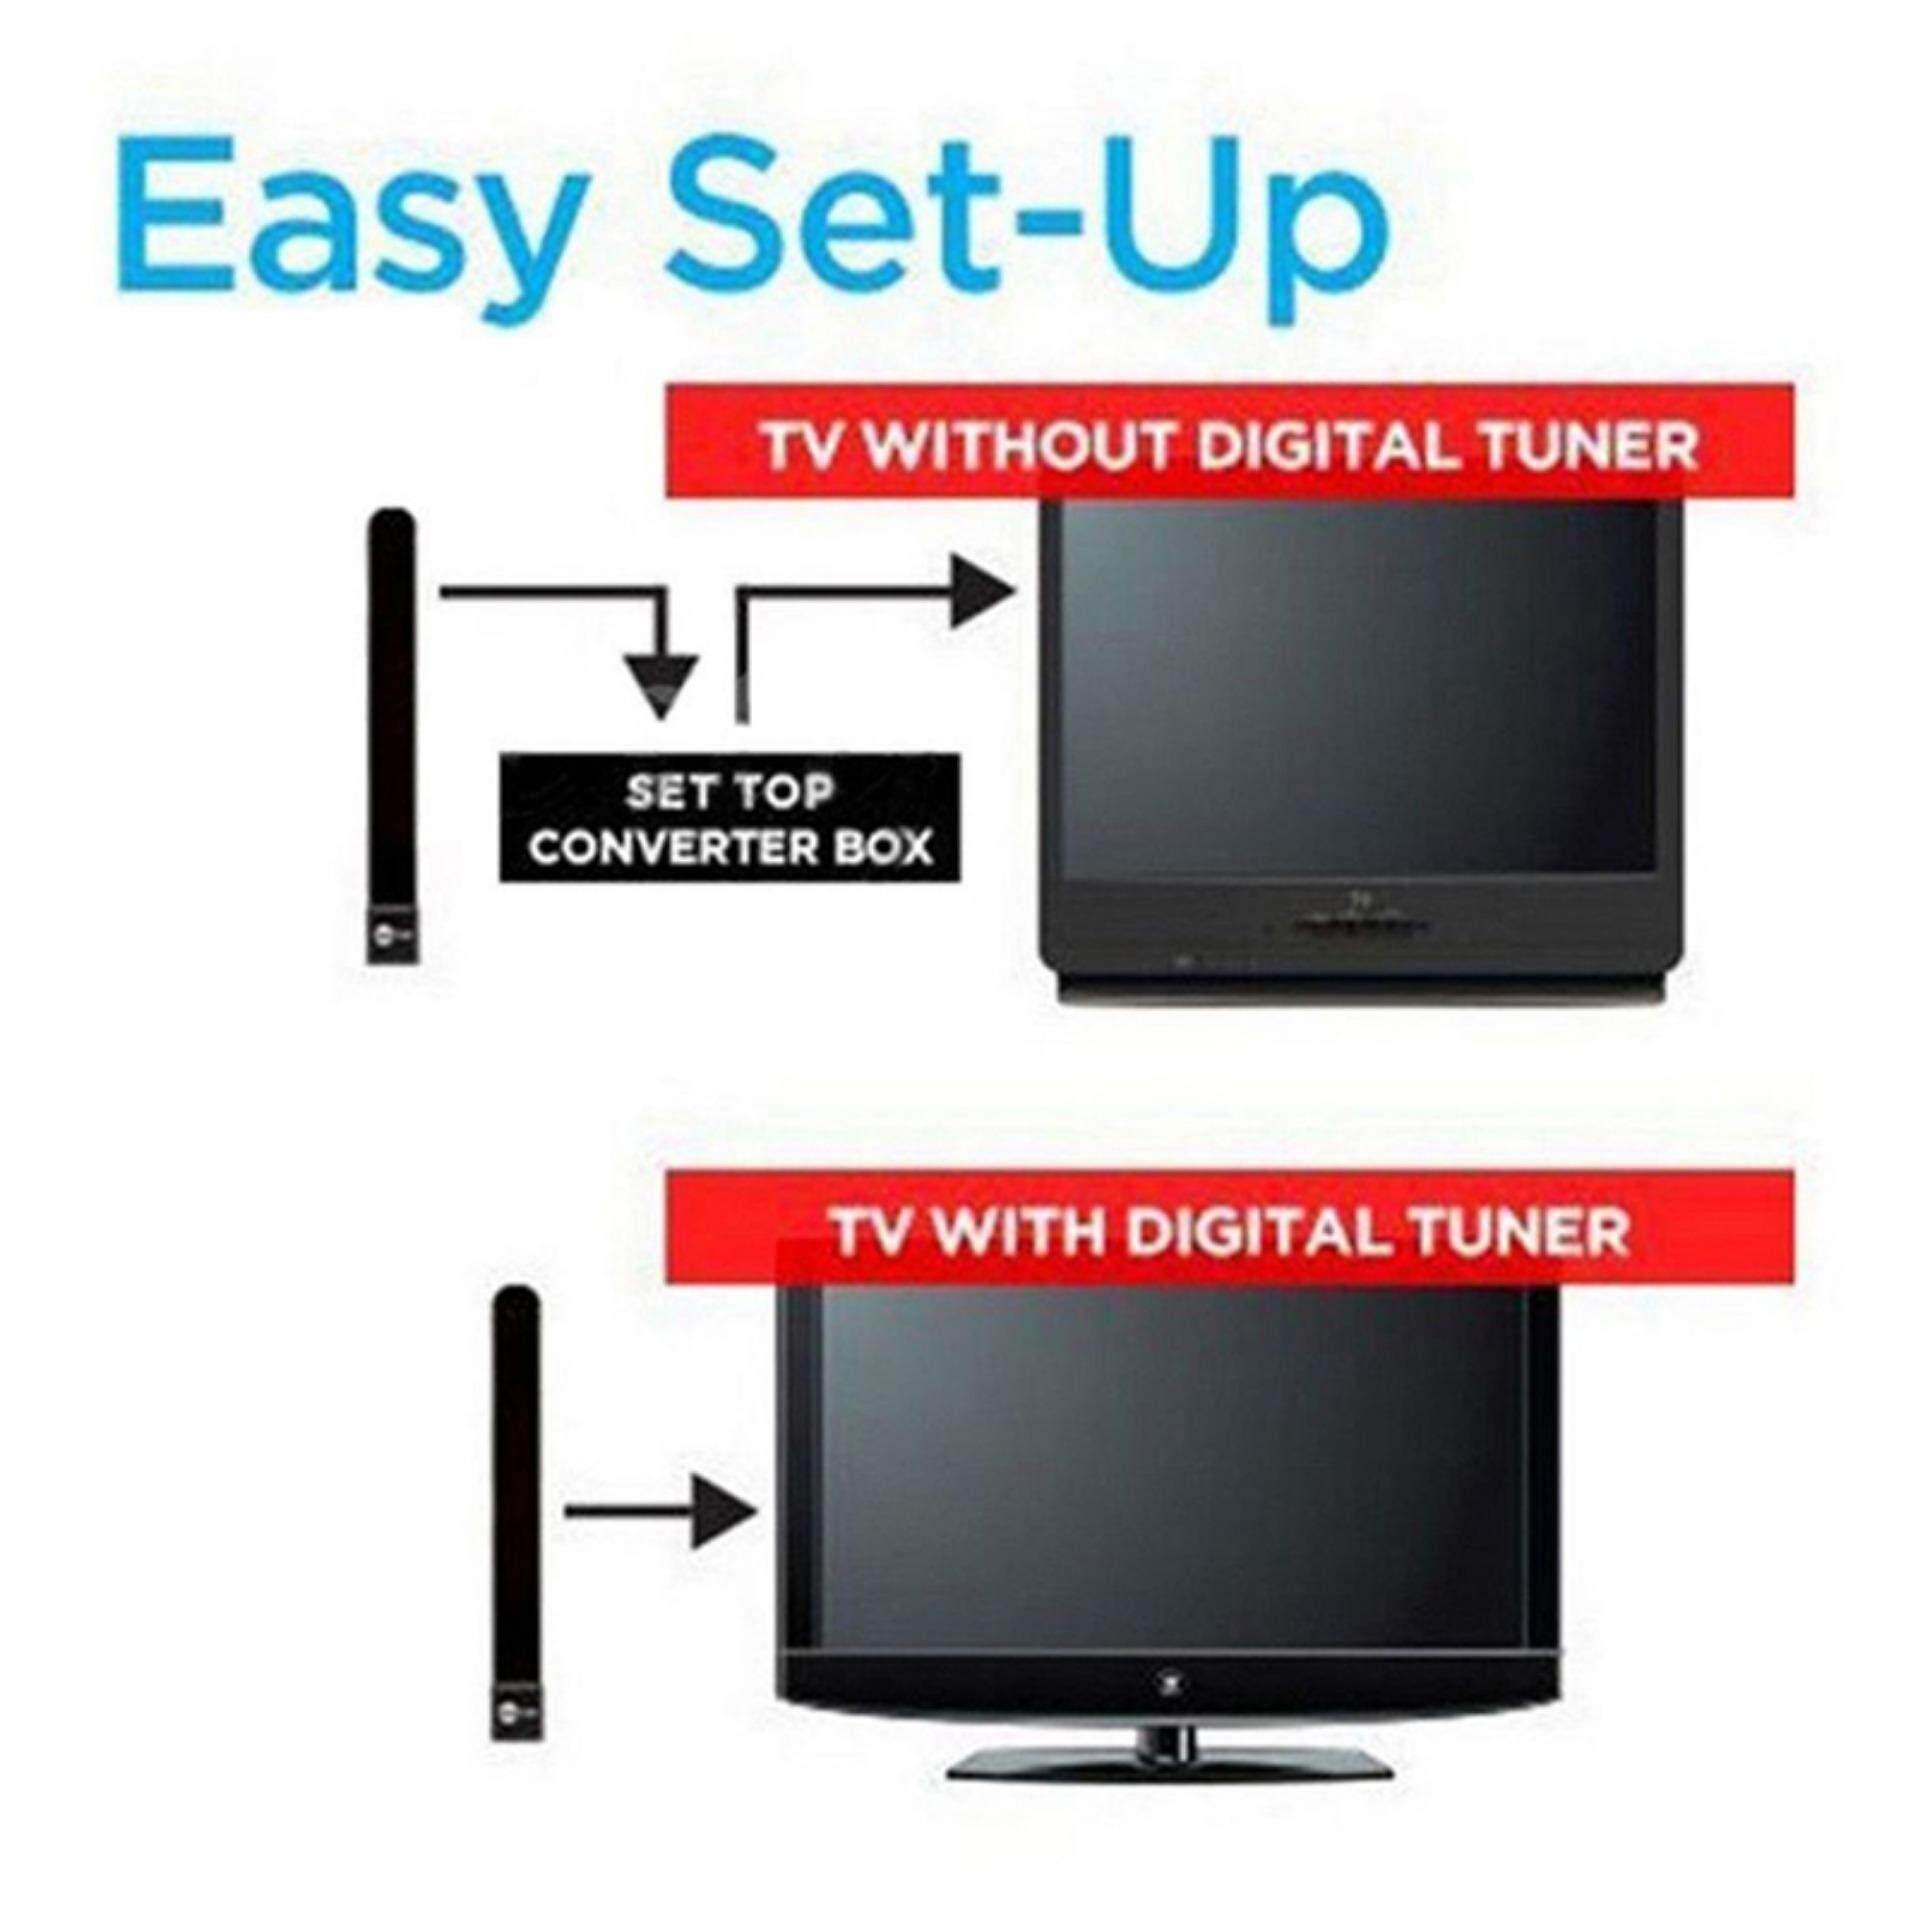 Hình ảnh Clear TV Key HDTV FREE TV Digital Indoor Antenna Ditch Cable As Seen on TV US EU 1080p